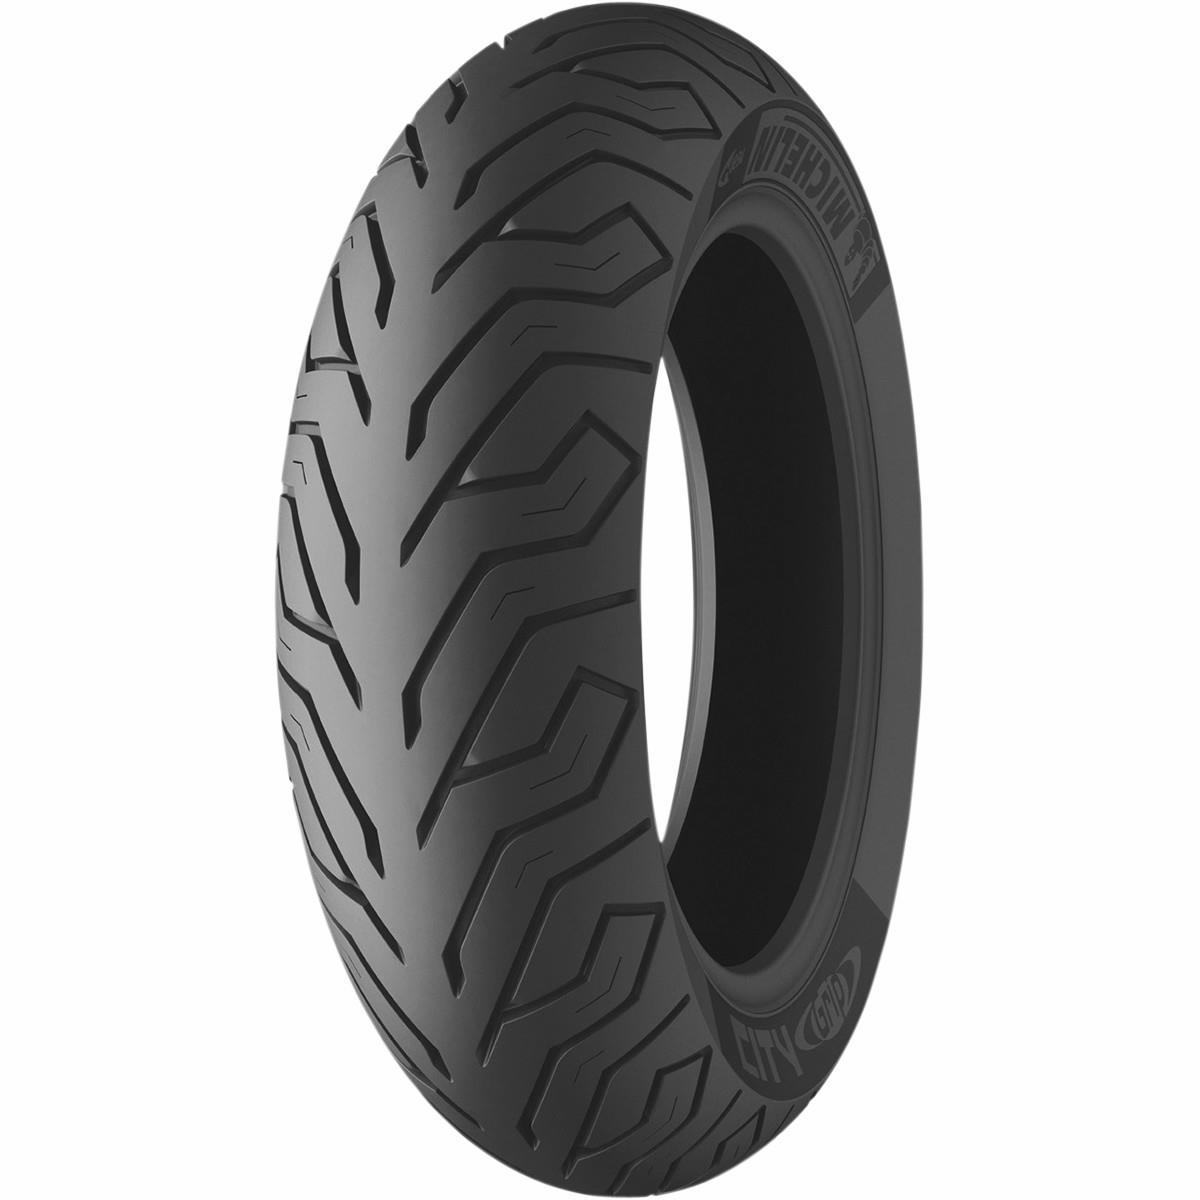 Michelin 07768 City Grip Scooter Rear Tire - 150/70-13